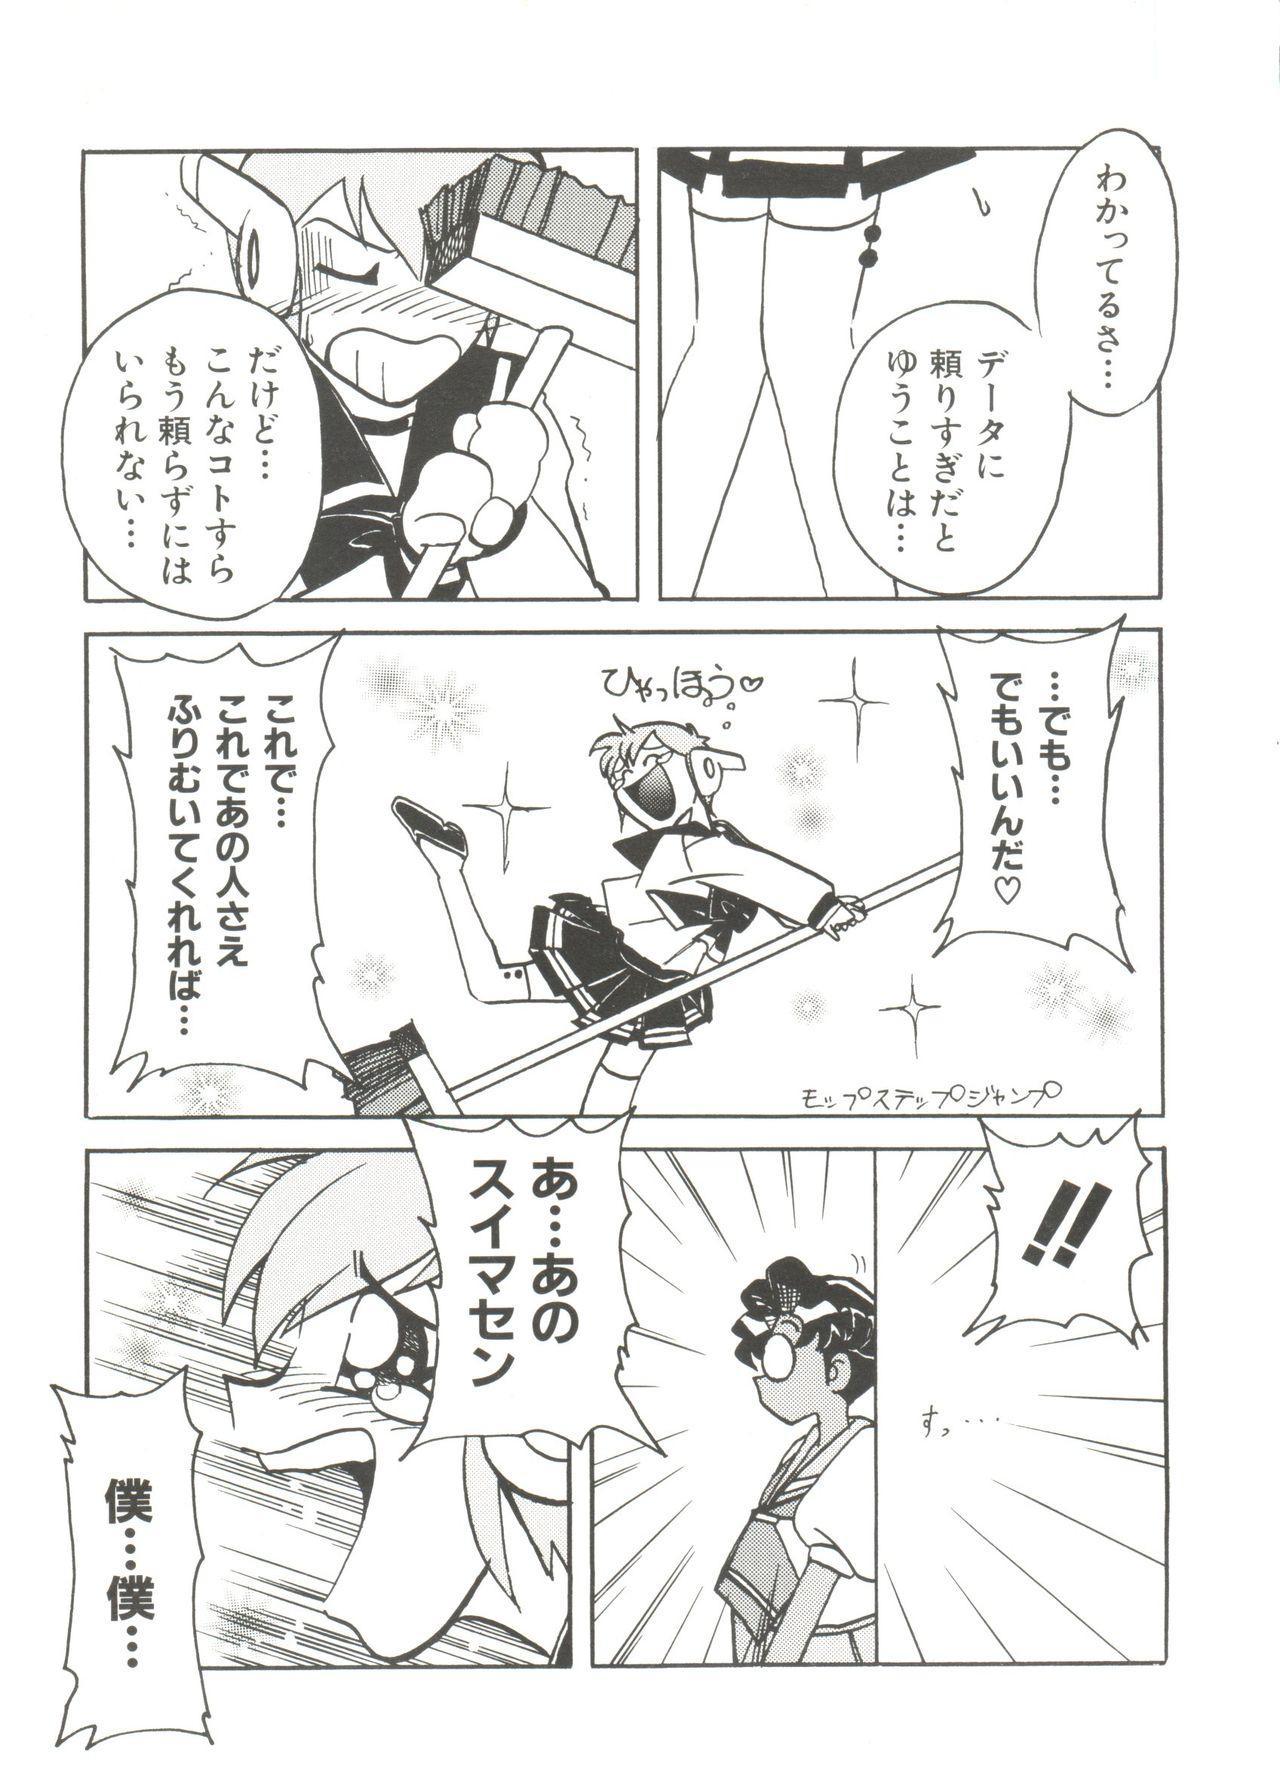 [Anthology] Denei Tamatebako 8 - Utakata no Tenshi-tachi II (Various) 136